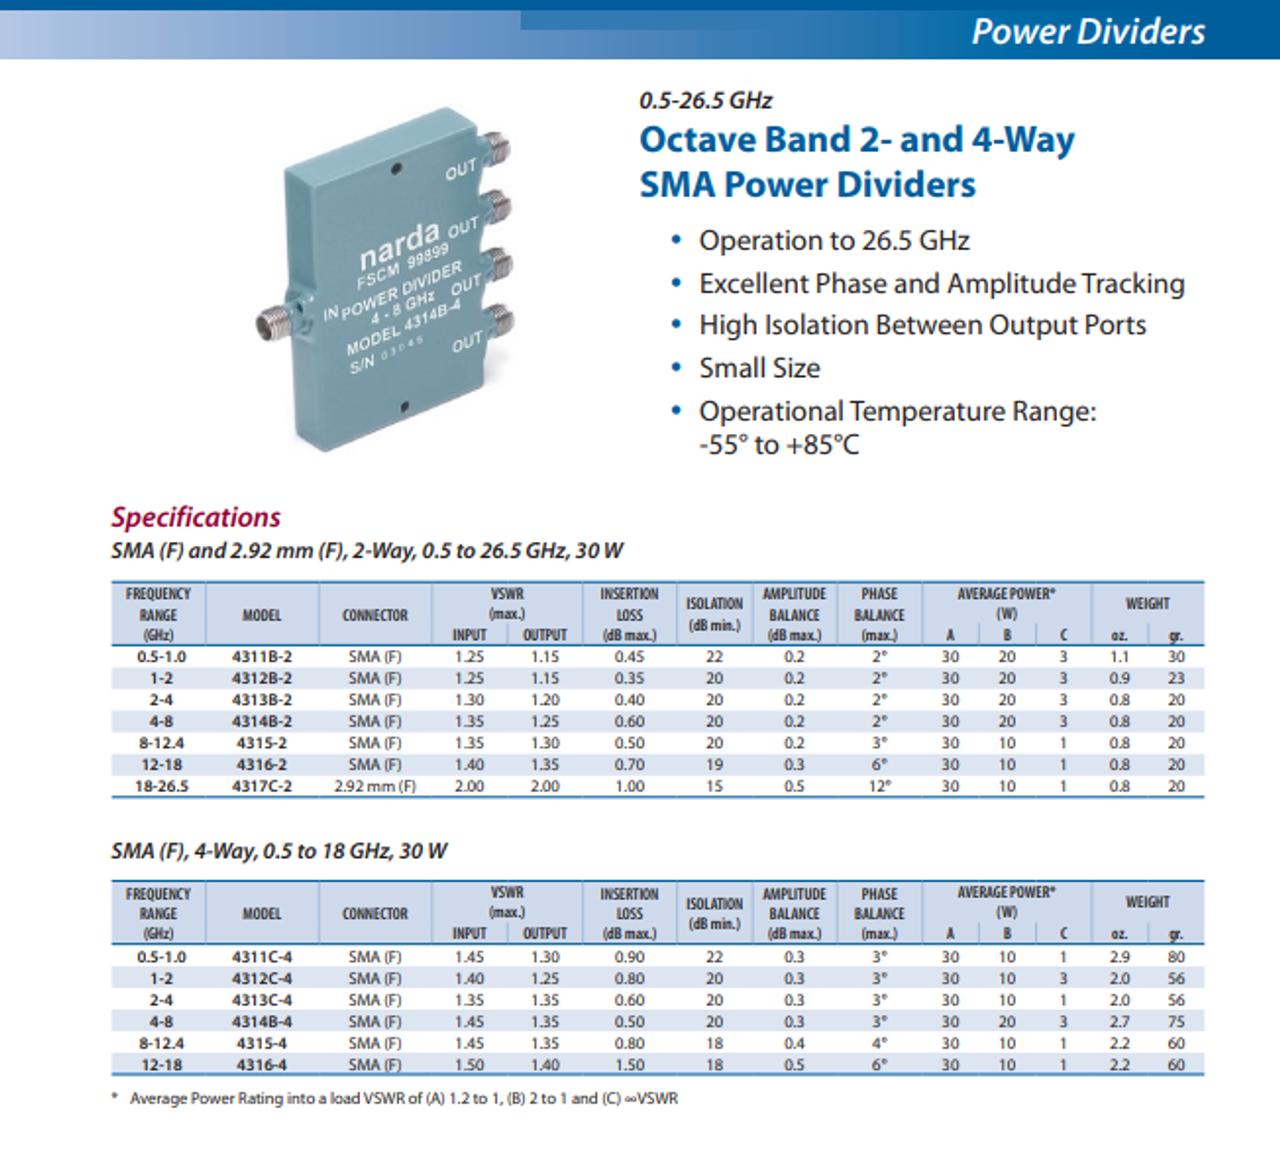 Narda 4311B-2 - 2-Way Power Divider